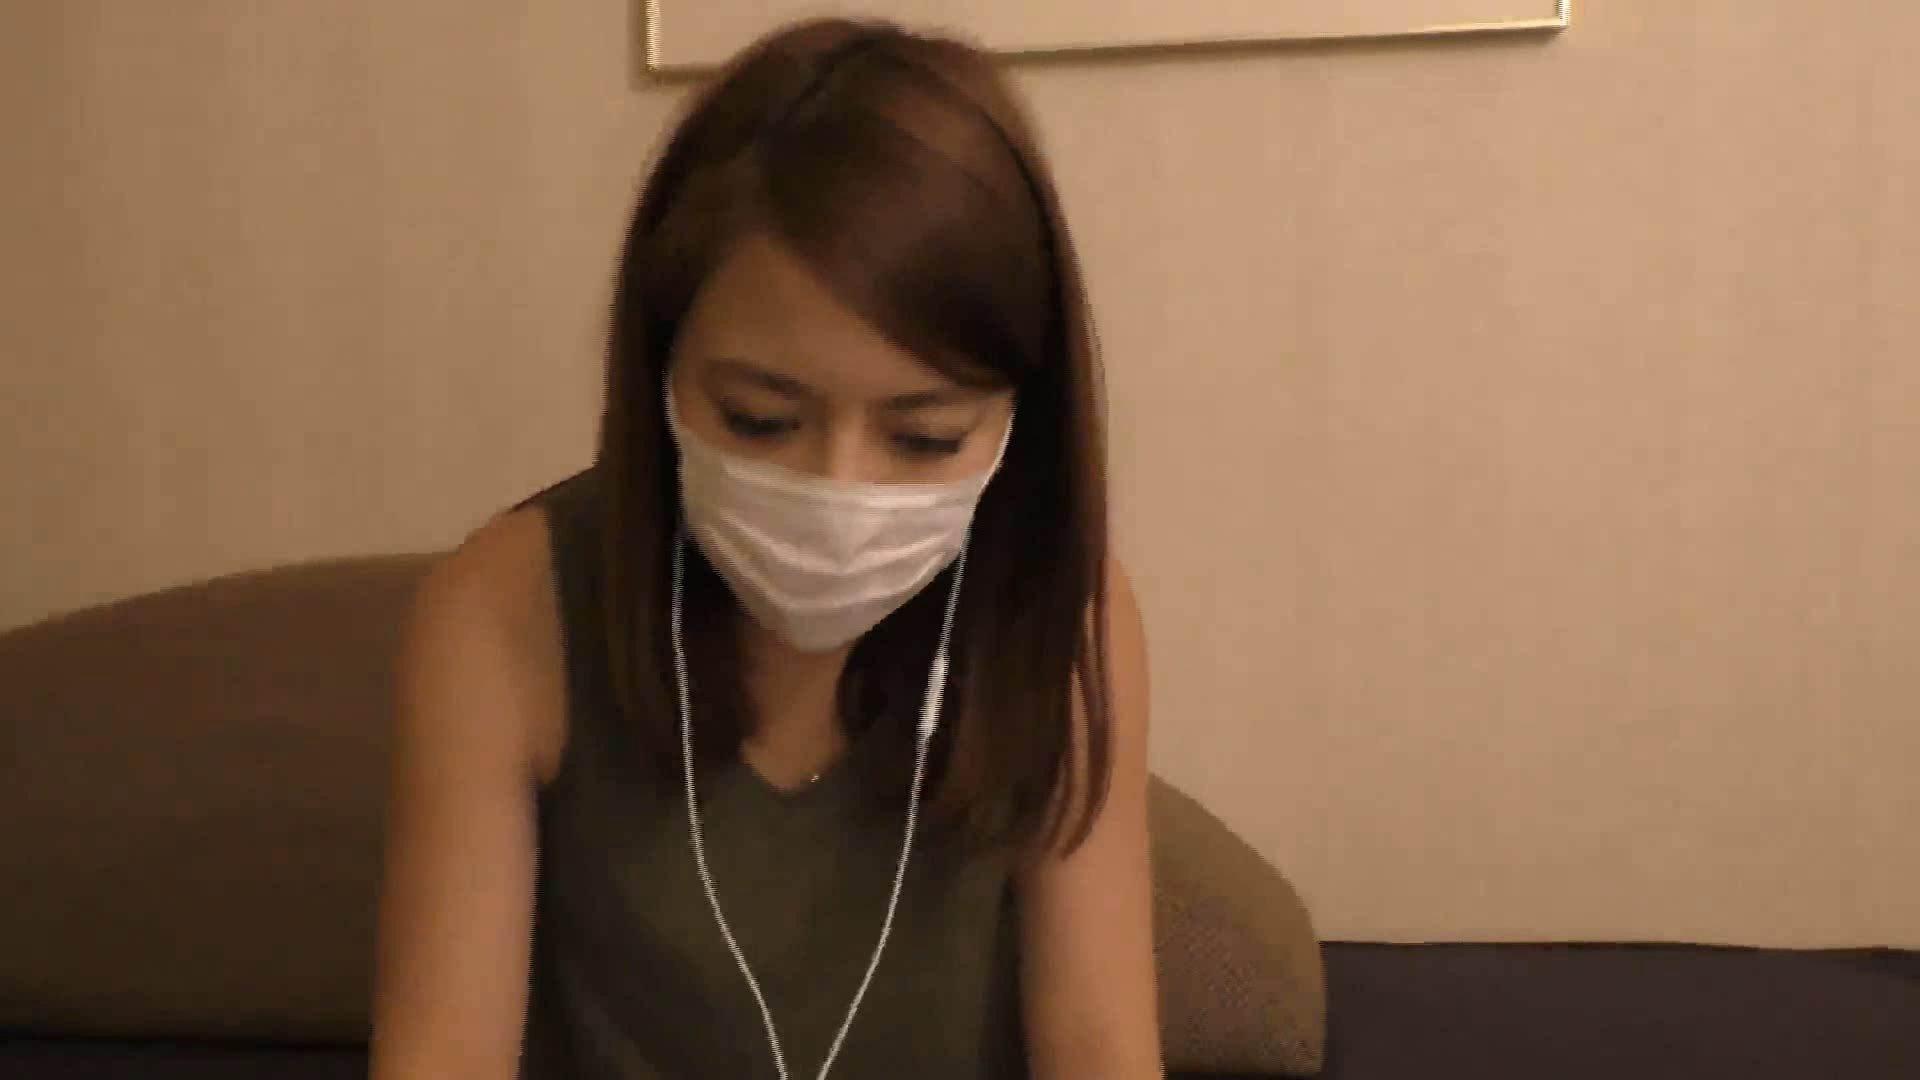 S級厳選美女ビッチガールVol.19 すけべなOL 性交動画流出 86画像 14